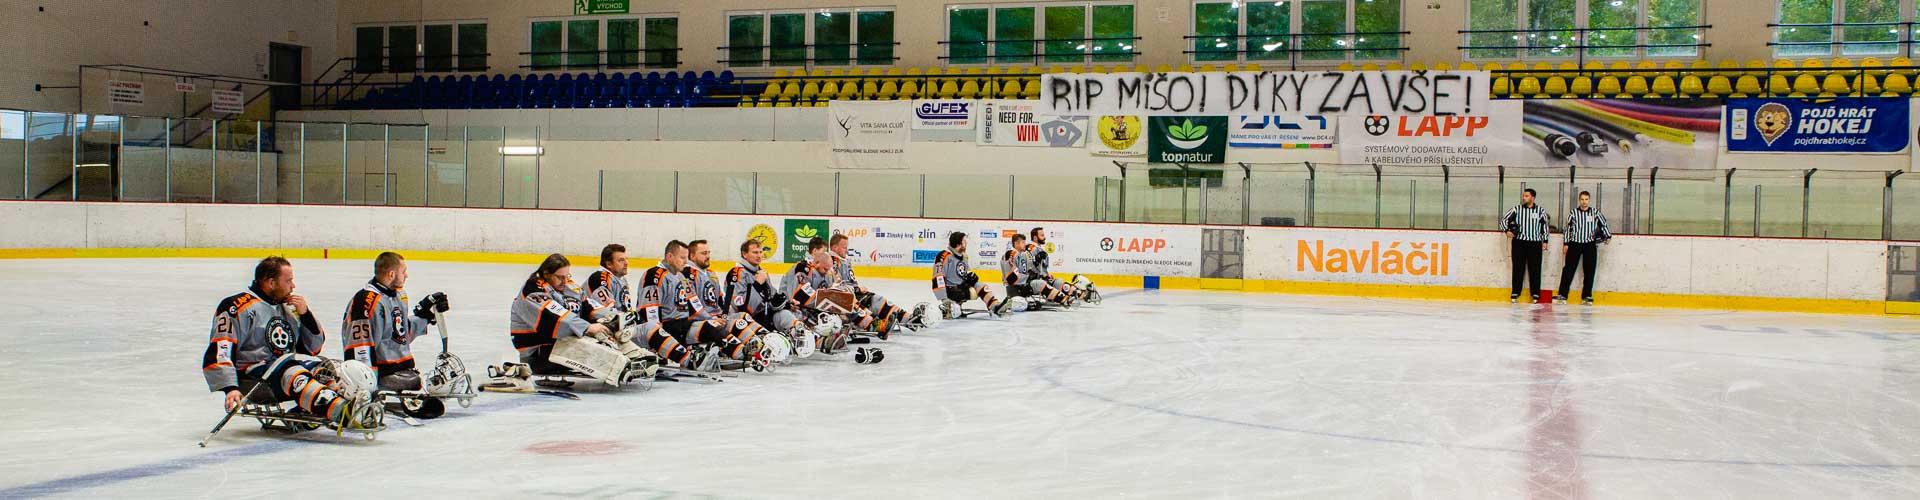 Sledge hokejisté na stadionu.